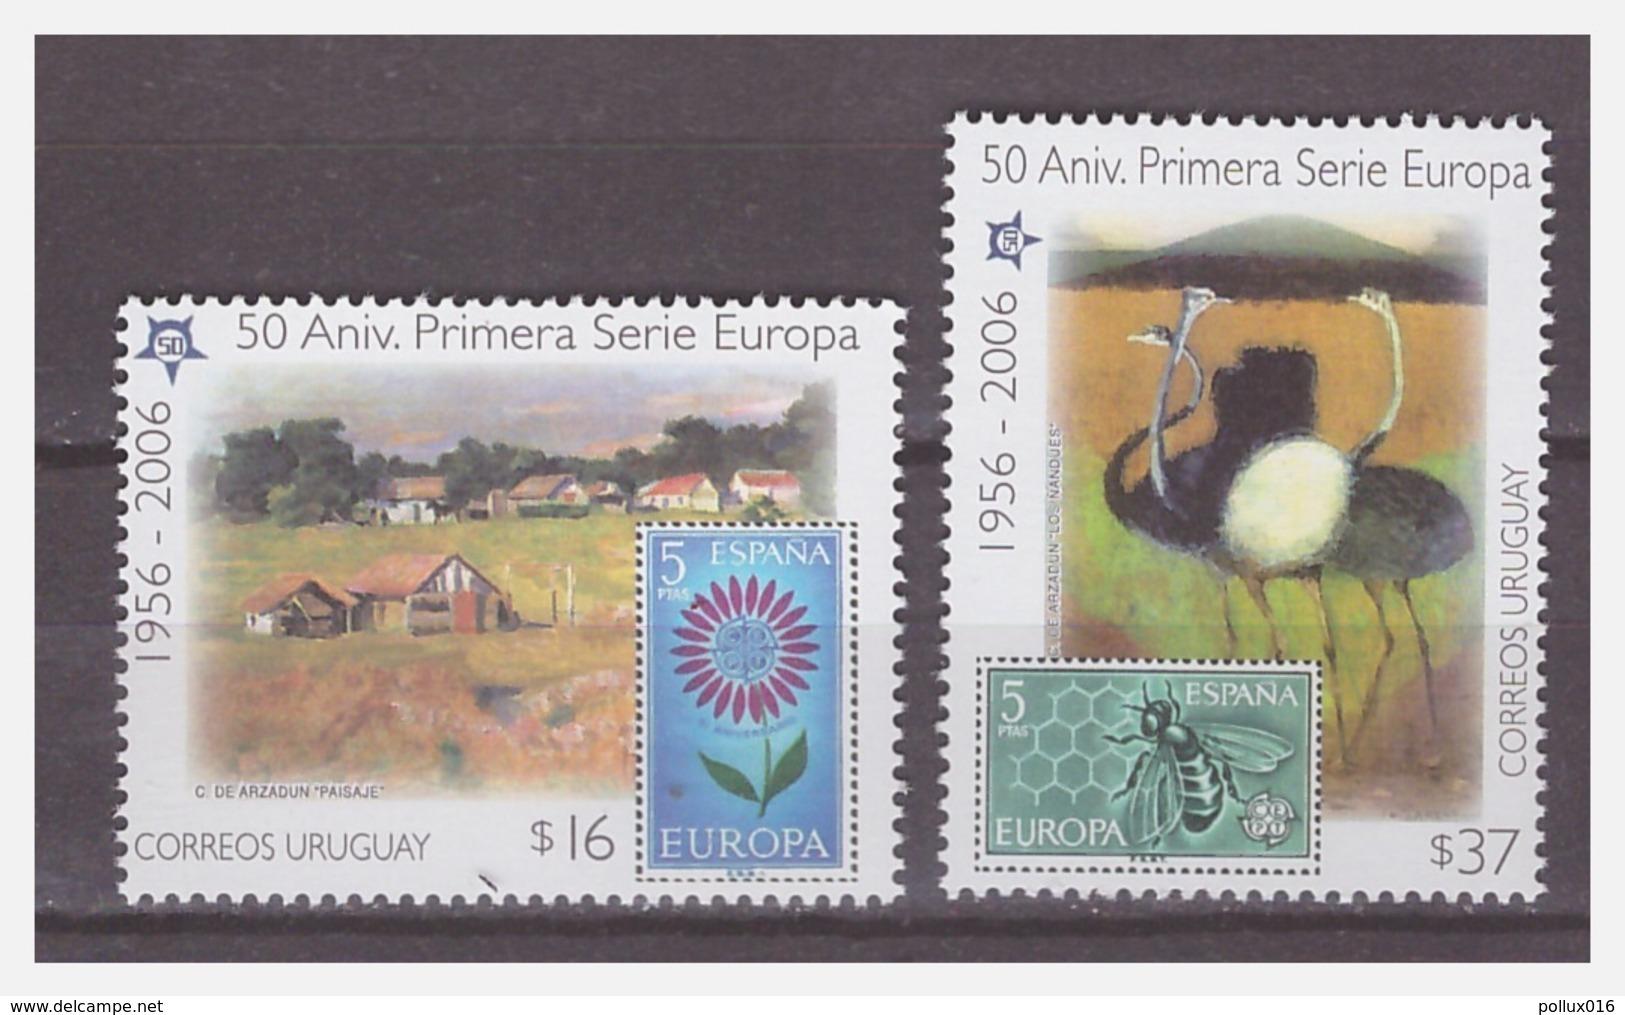 1034 Uruguay 2006 50 Year Europa Europe CEPT Honey-bee Ostrich MNH - Europa-CEPT